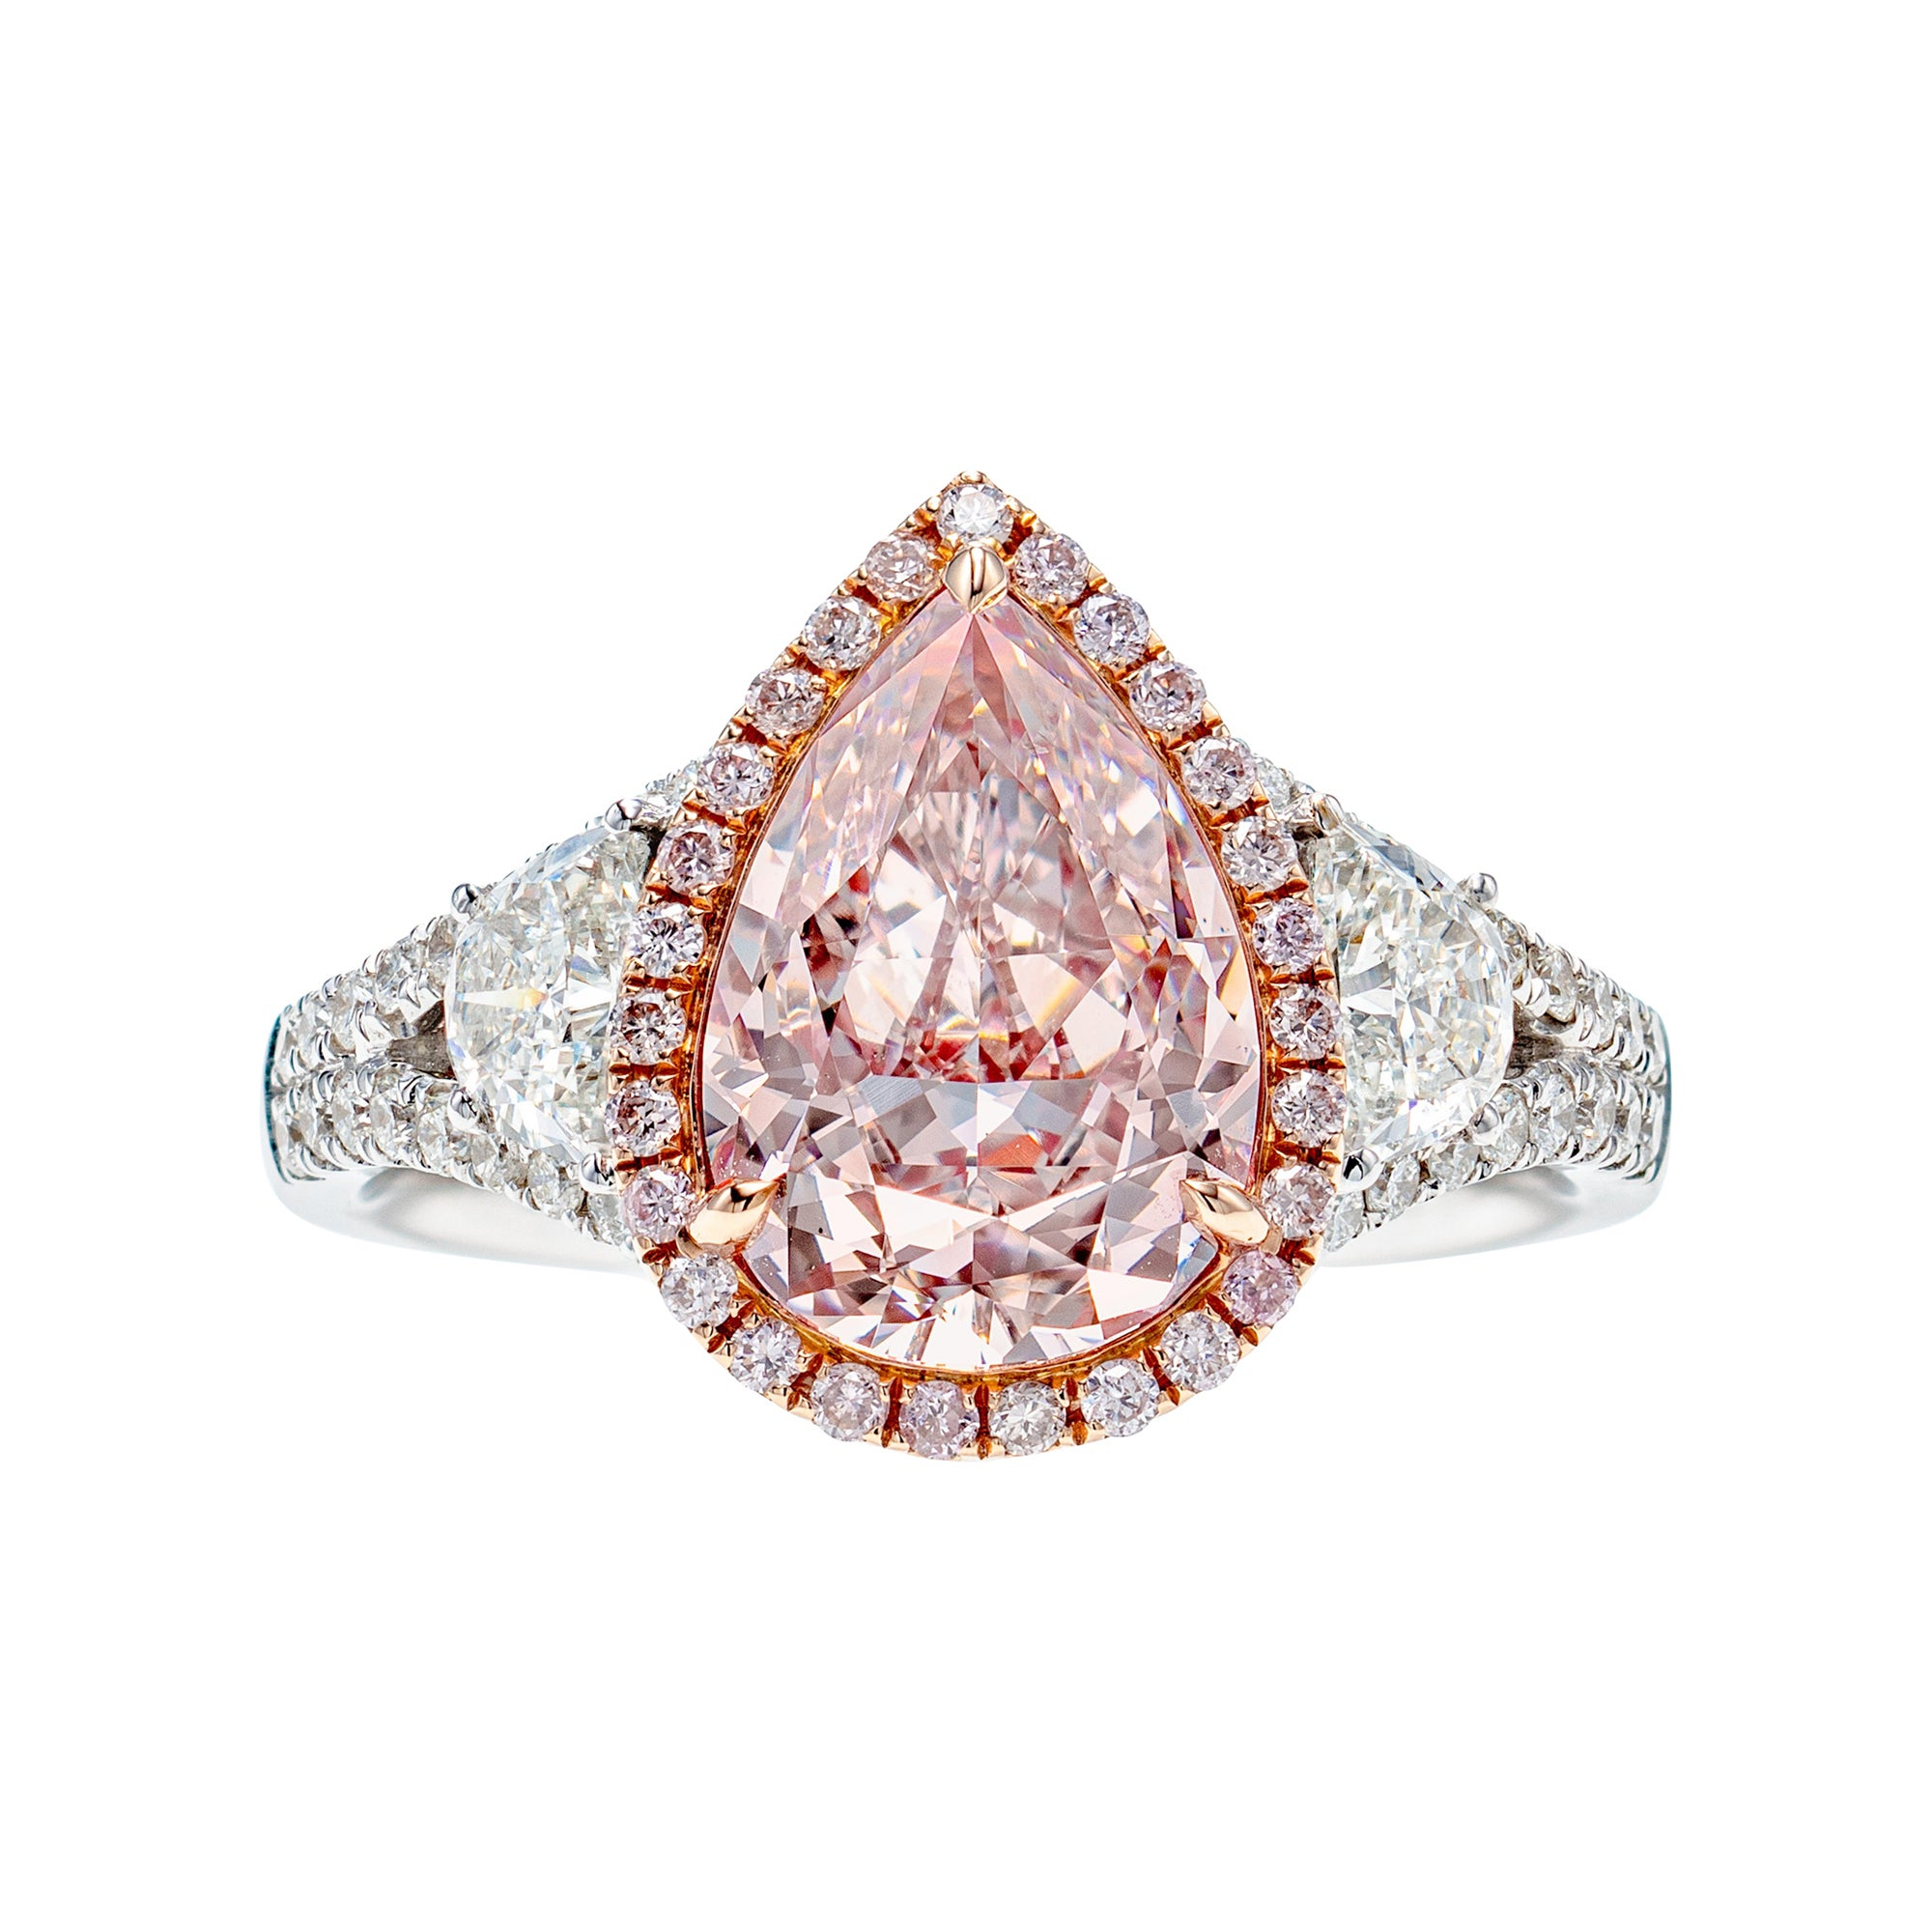 GIA Certified 3.44 Carat Very Light Pink Pear Diamond Ring in 18K Gold